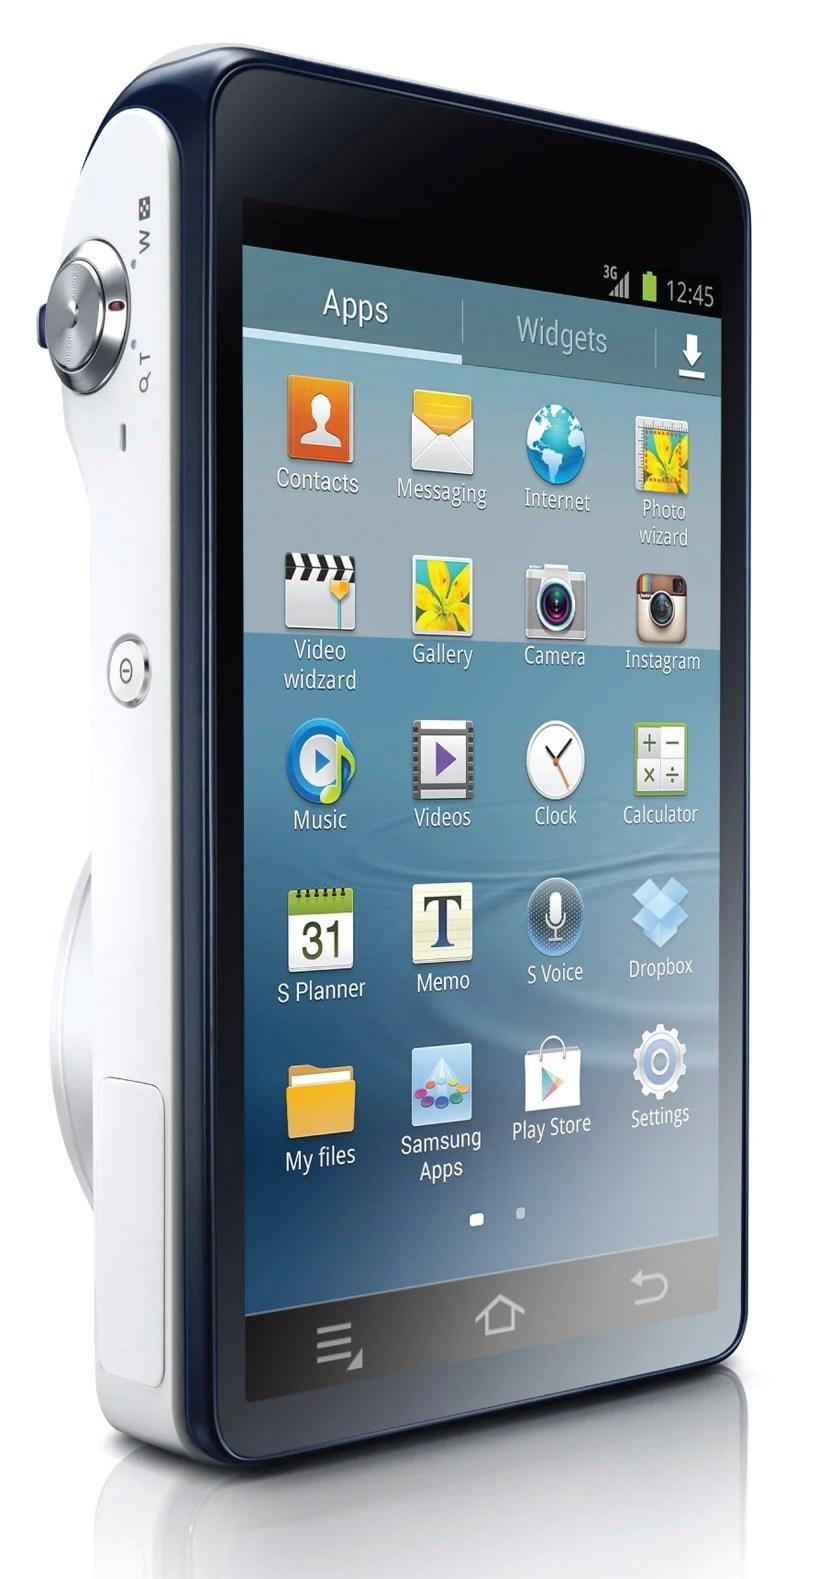 Diverting Android Powered Samsung Galaxy Digital Camera Samsung Camera App Remote Viewfinder Samsung Camera Application dpreview Samsung Smart Camera App